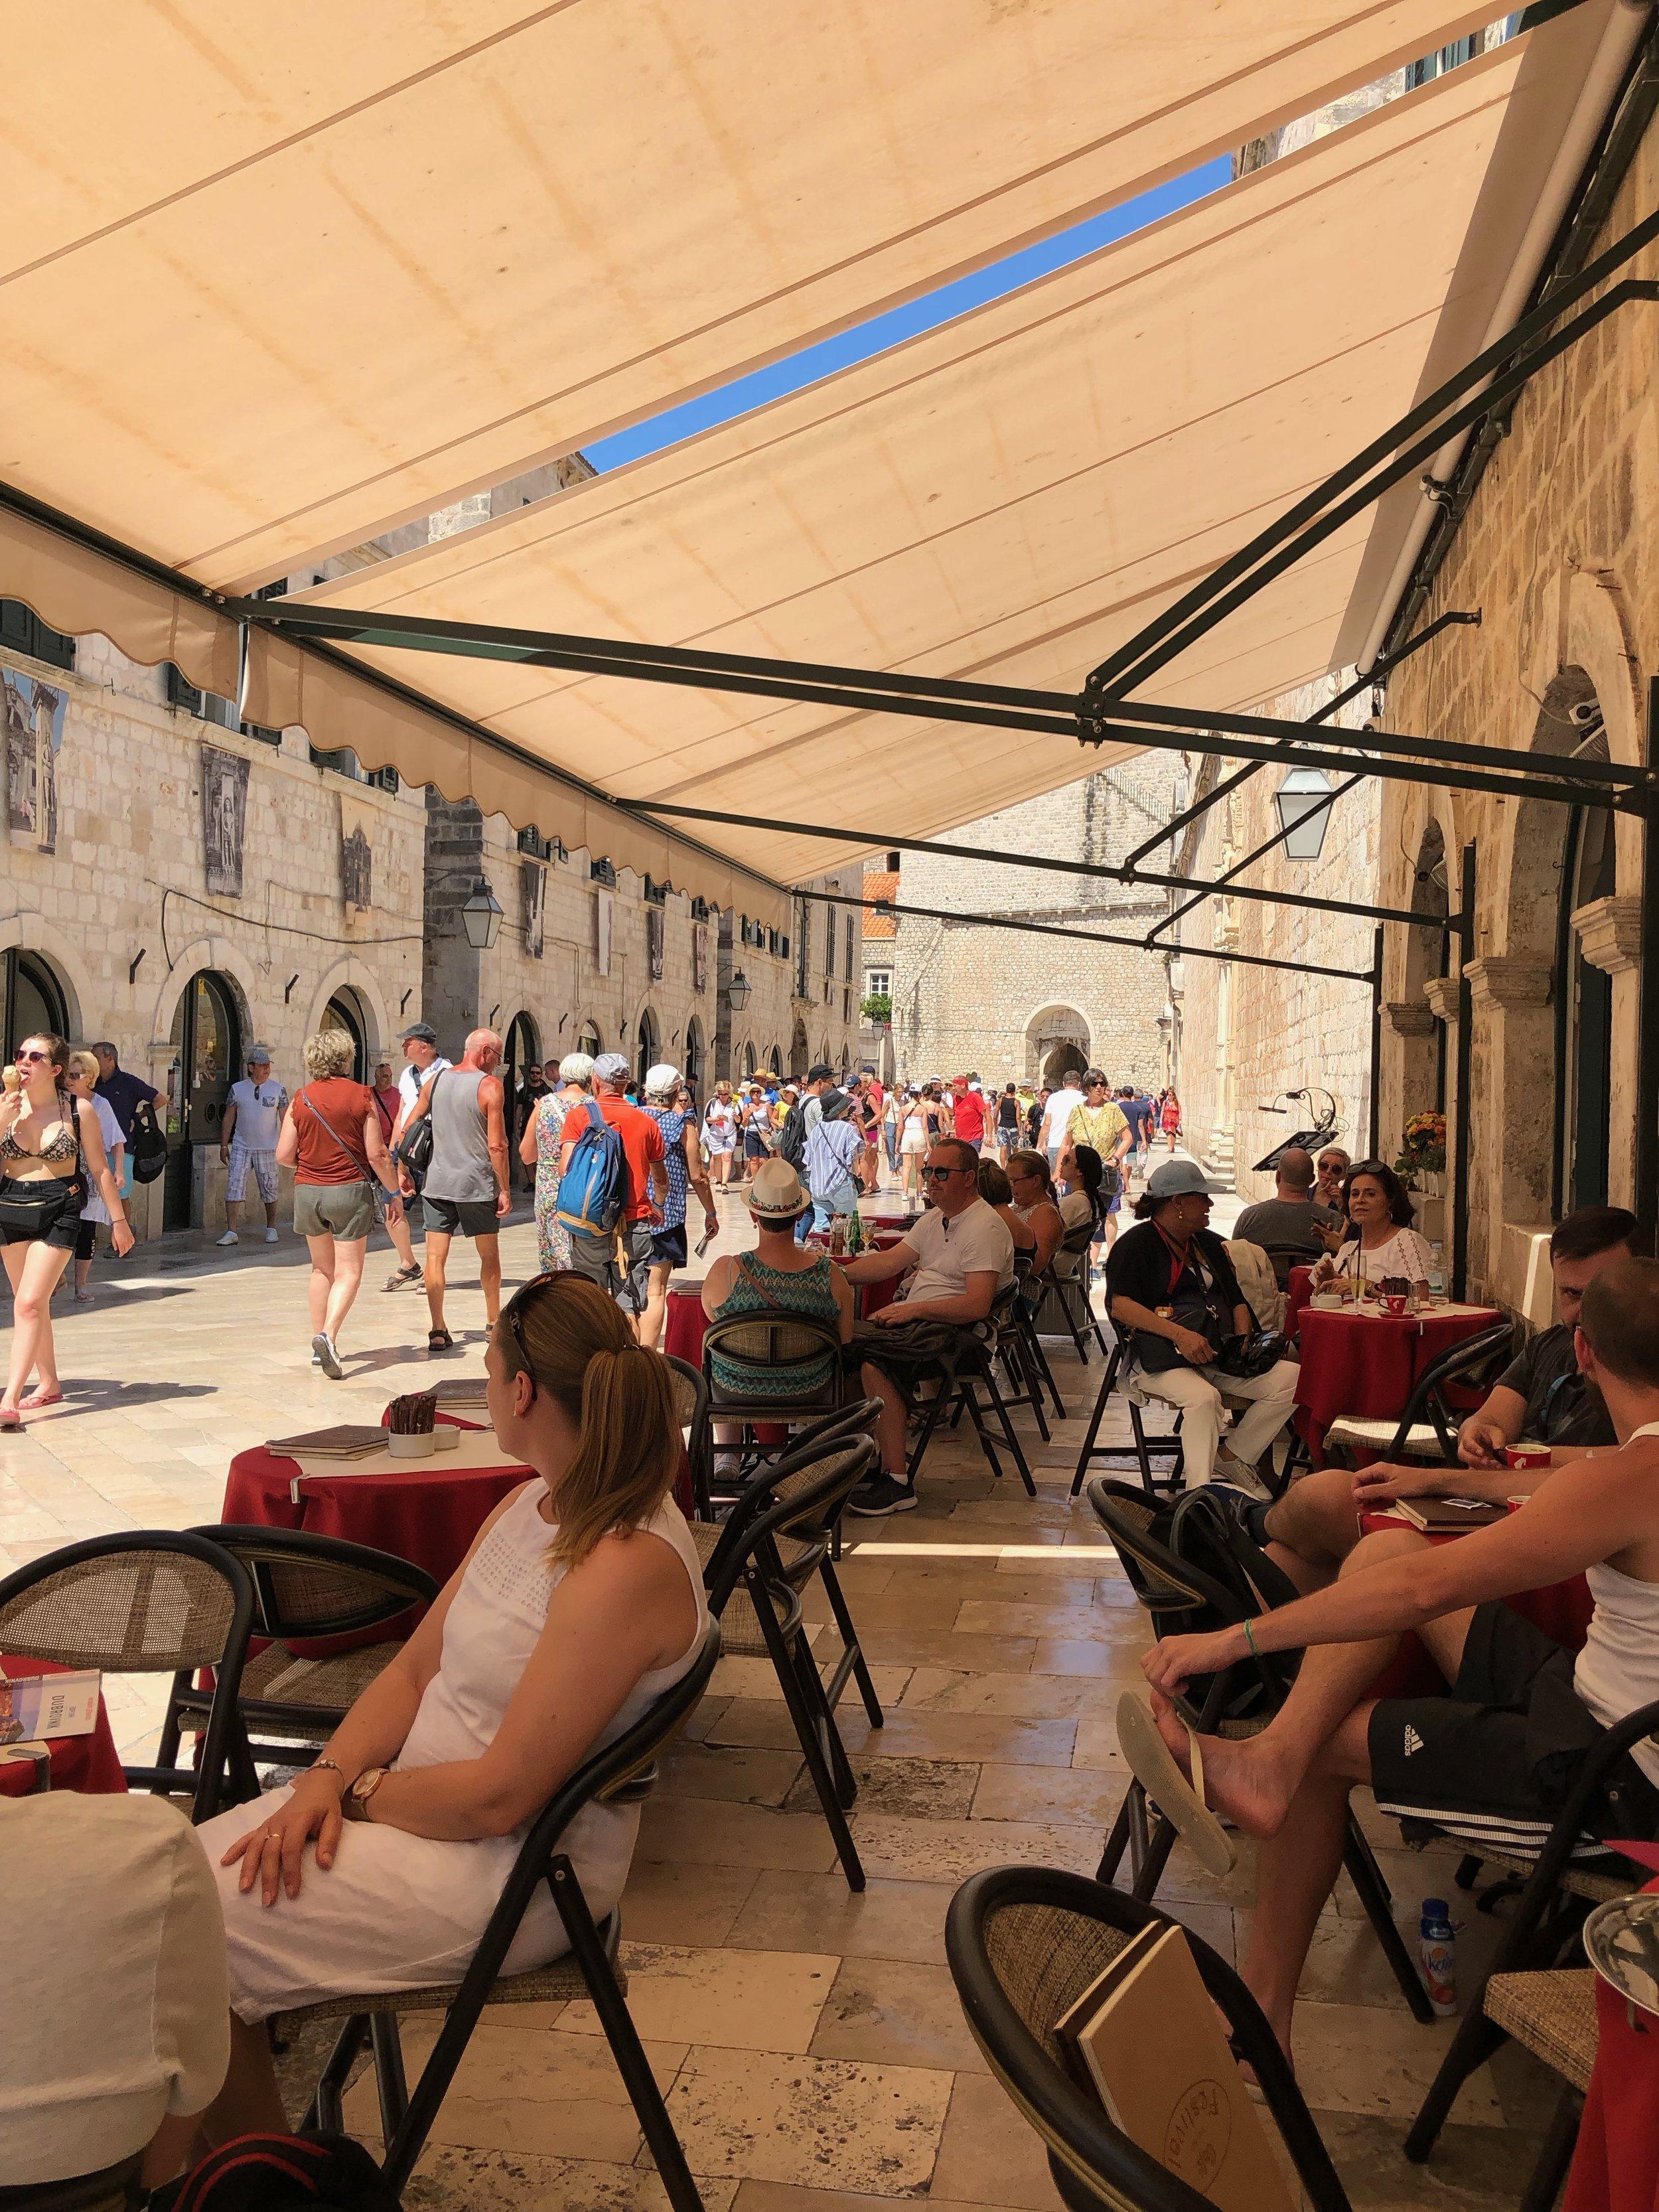 Cafe in Dubrovnik.